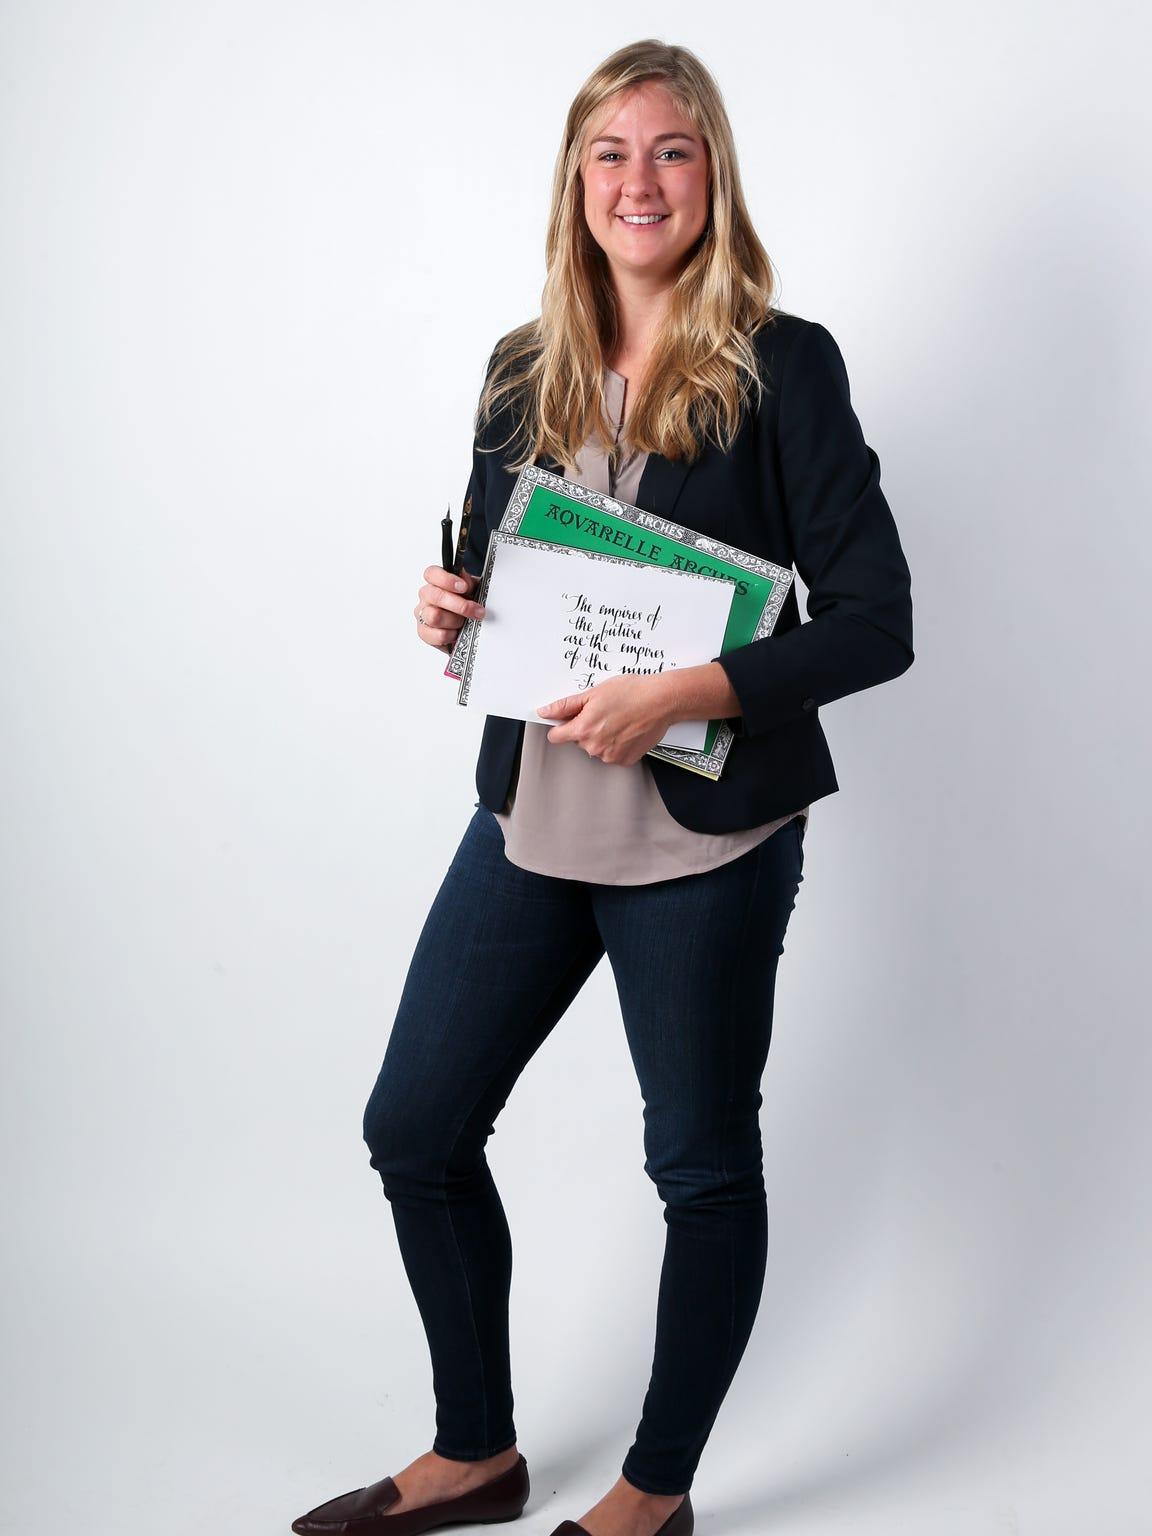 Jessica Pirkle, Vice President of Marketing at Principal